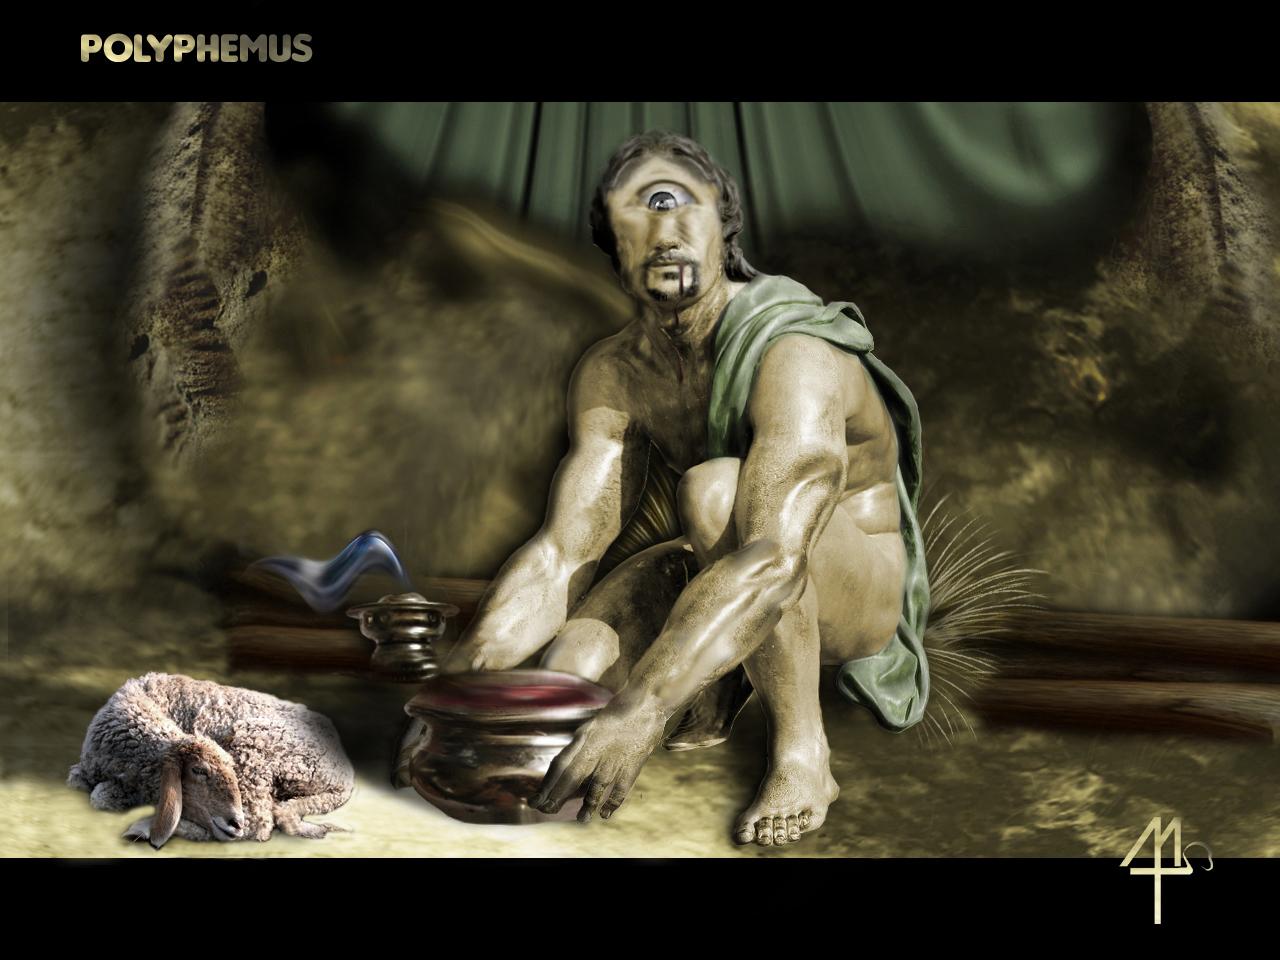 49th: Polyphemus by MaestroTomberi